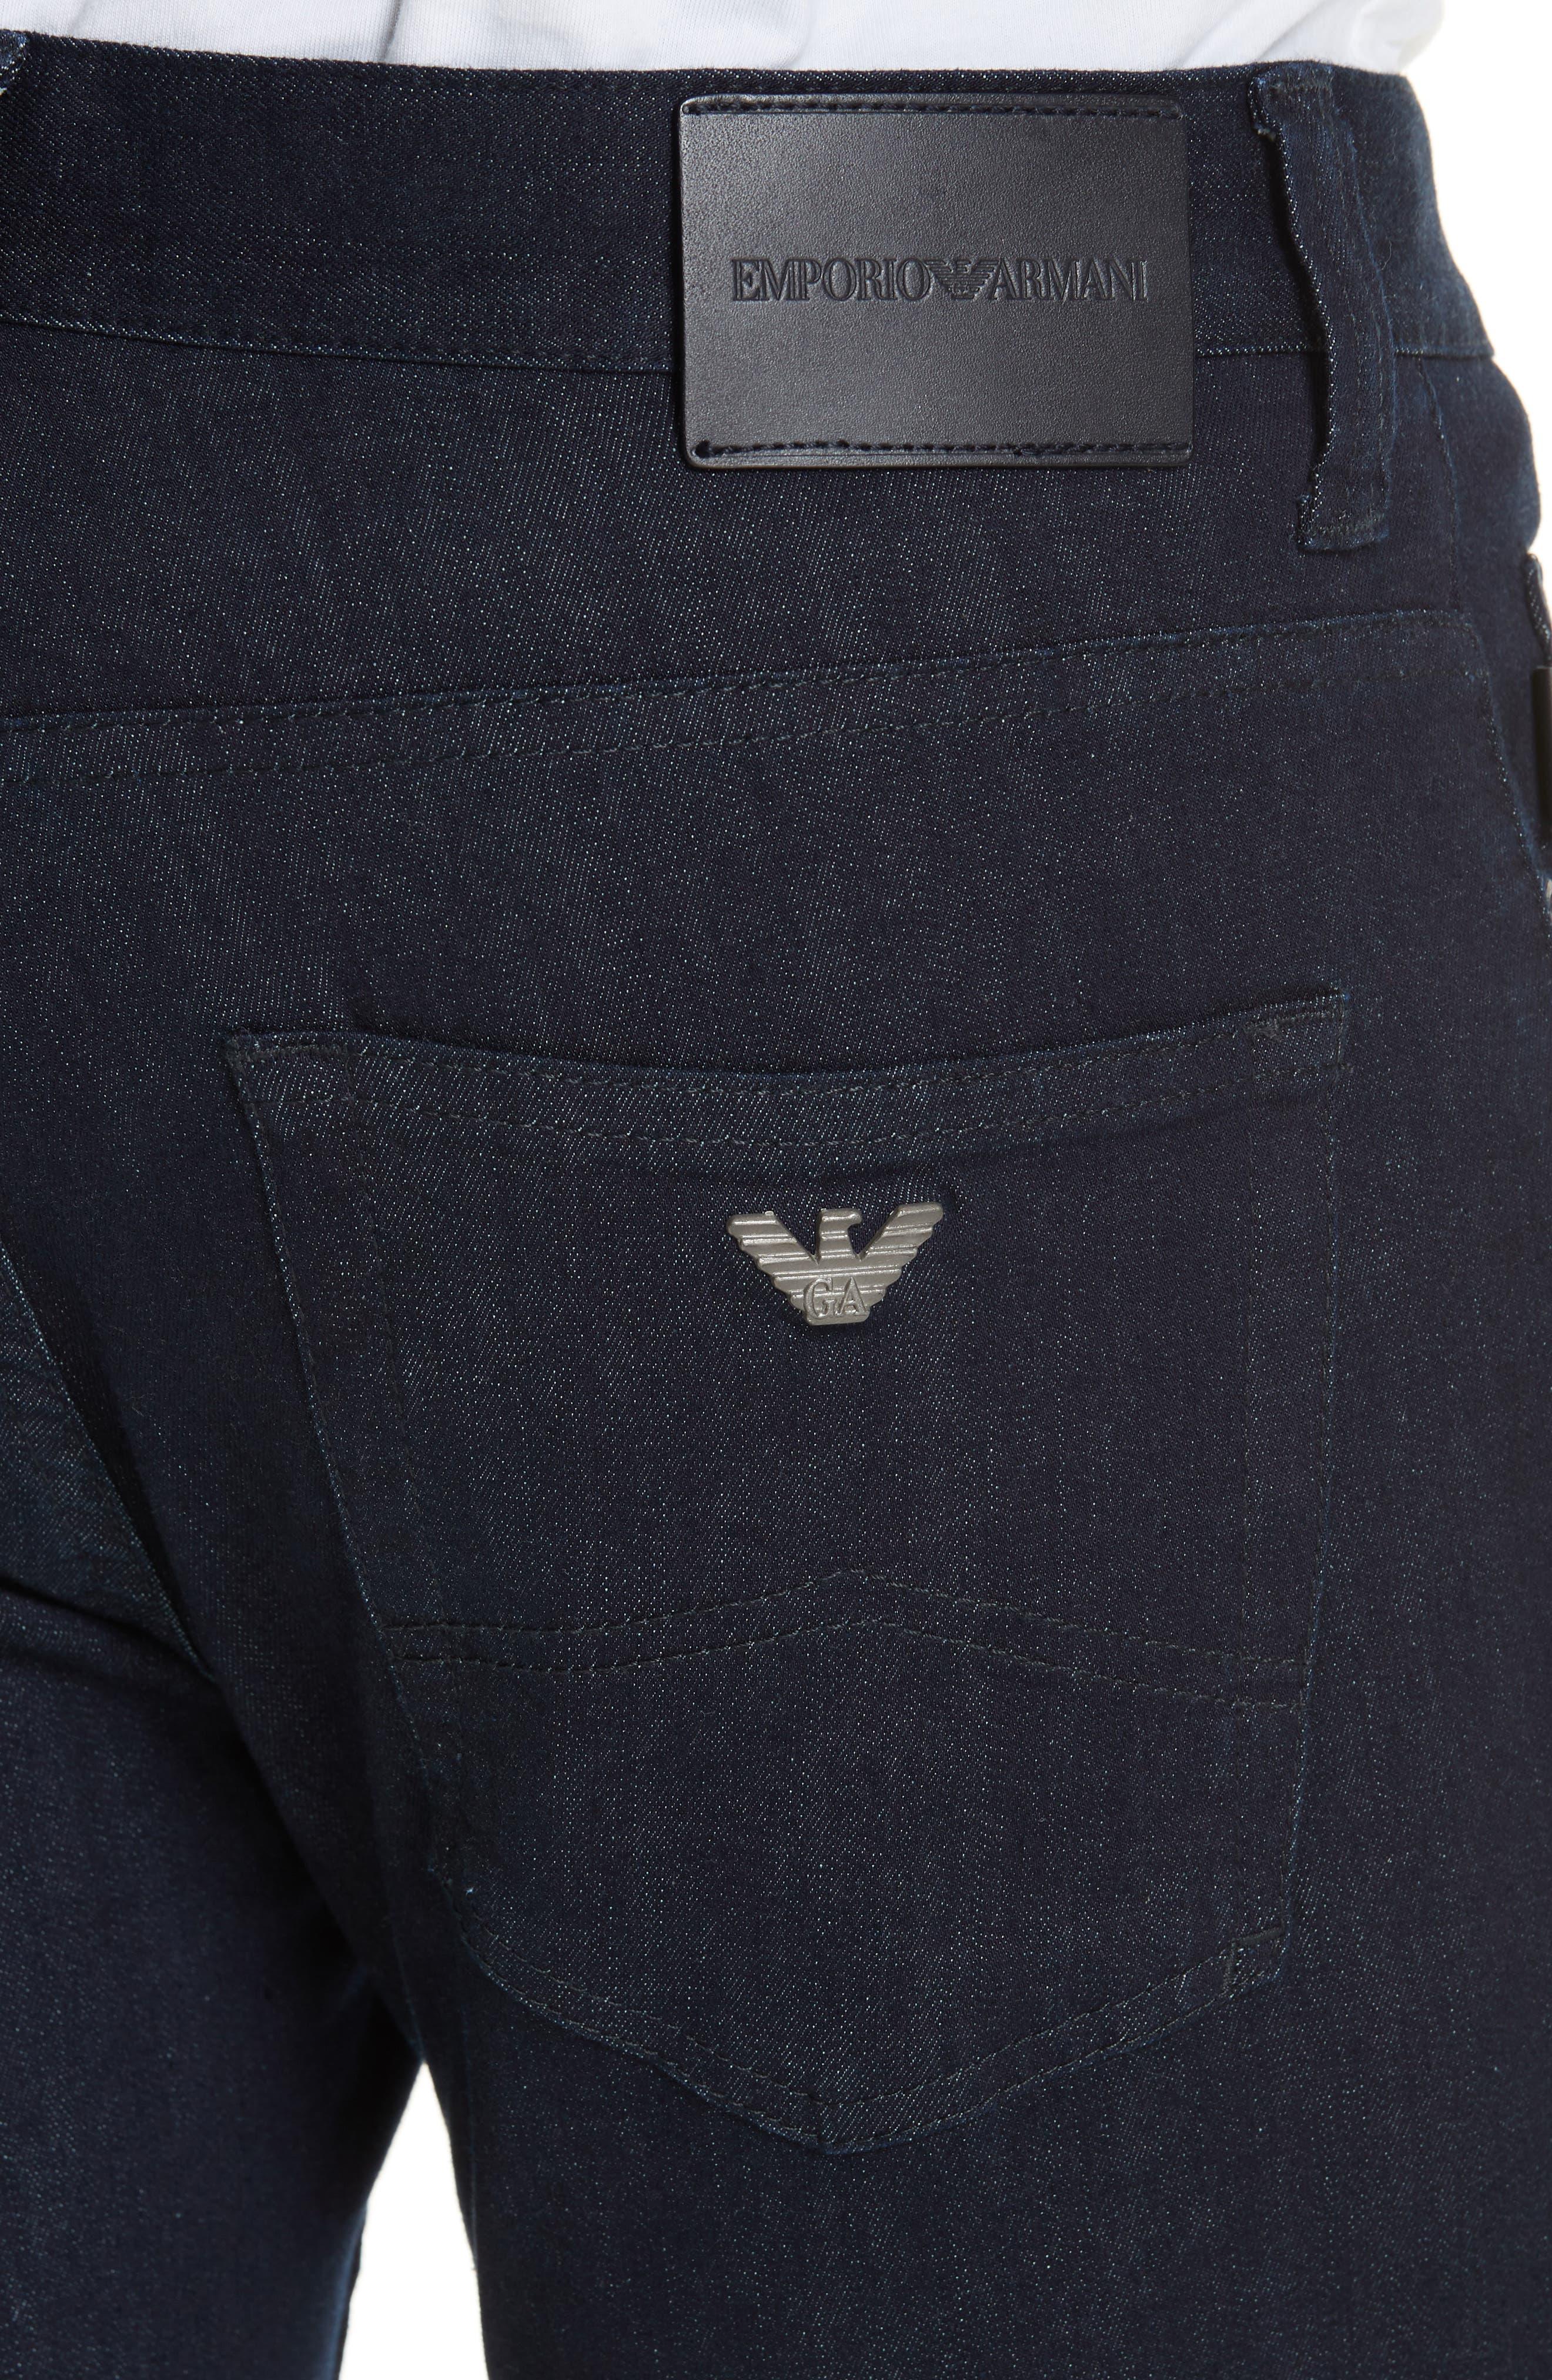 Straight Leg Stretch Jeans,                             Alternate thumbnail 5, color,                             DARK BLUE